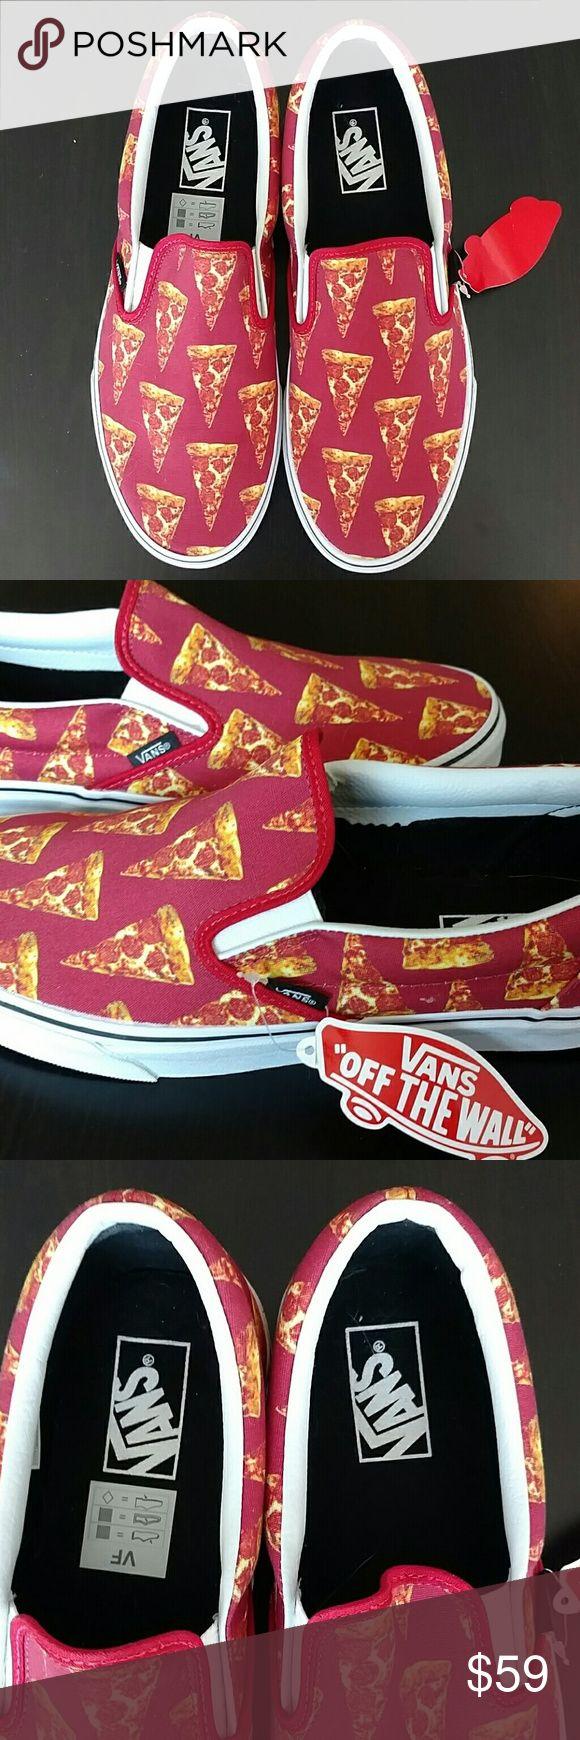 "Vans Pizza Print Sneakers Vans ""off the wall"" pizza print 🍕🍕🍕🍕 slip on sneakers. NWT. Size 9.5 Men's or 11 Women's. Vans Shoes Sneakers"